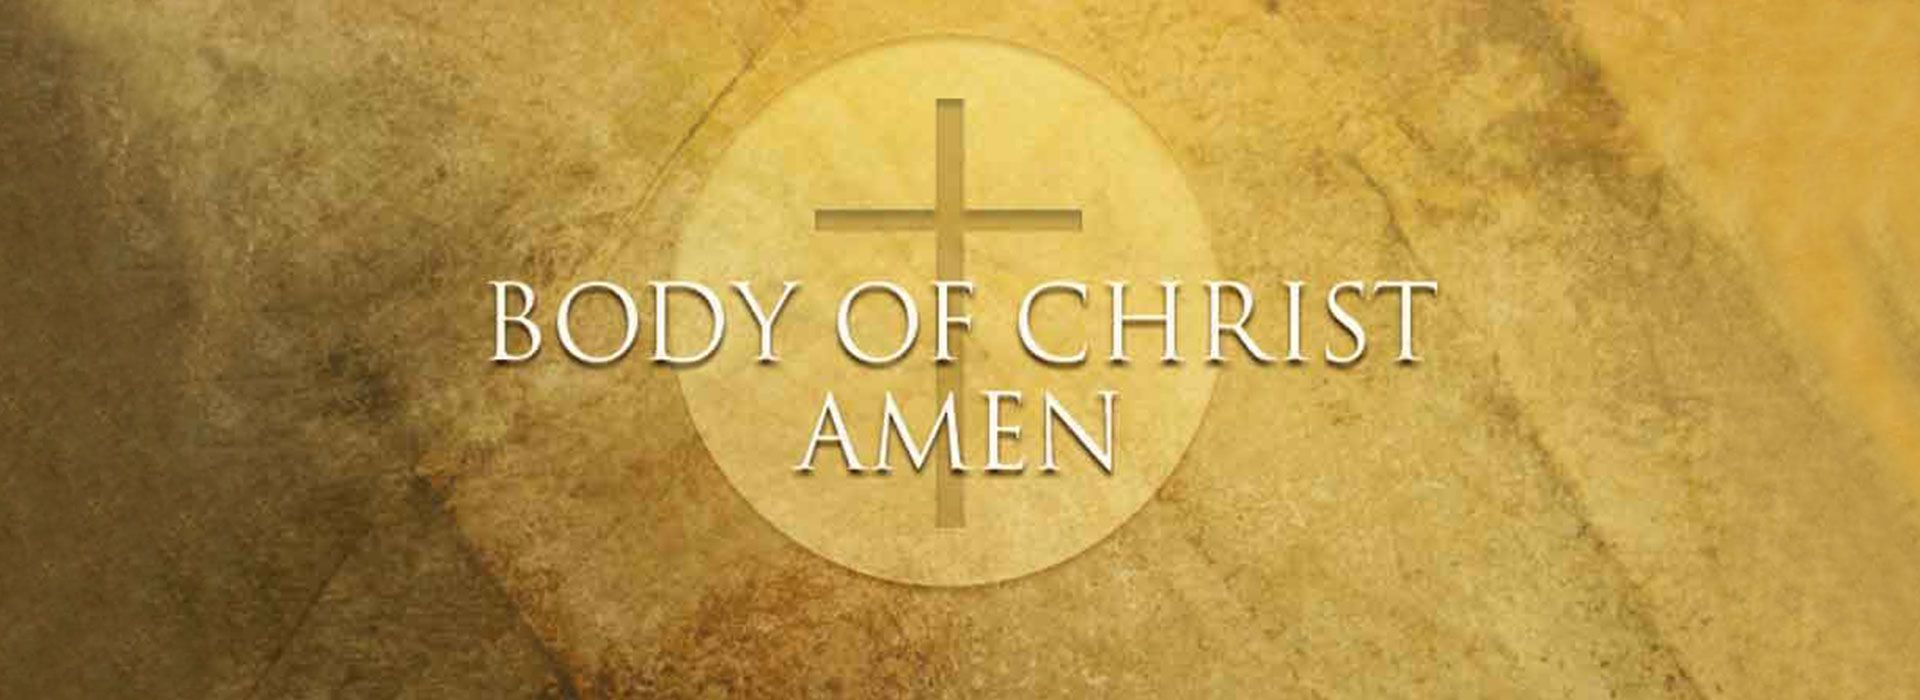 Corpus Christi, The Body & Blood of Christ